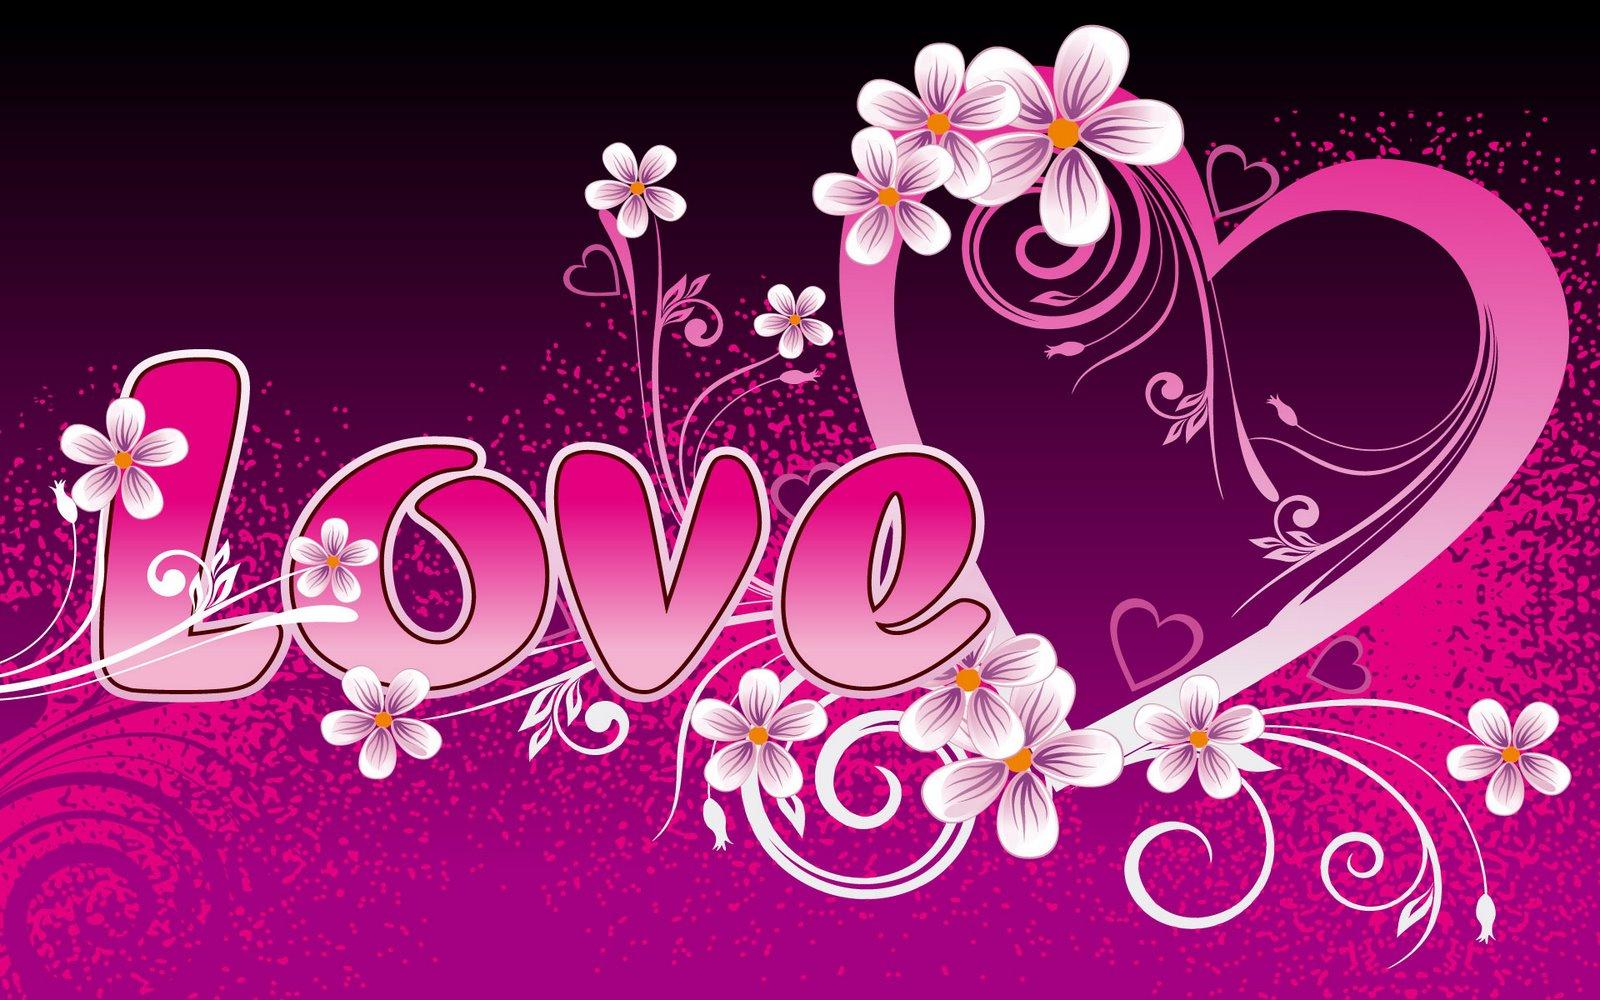 new wallpaper on 2012: beautiful pink love art wallpapers